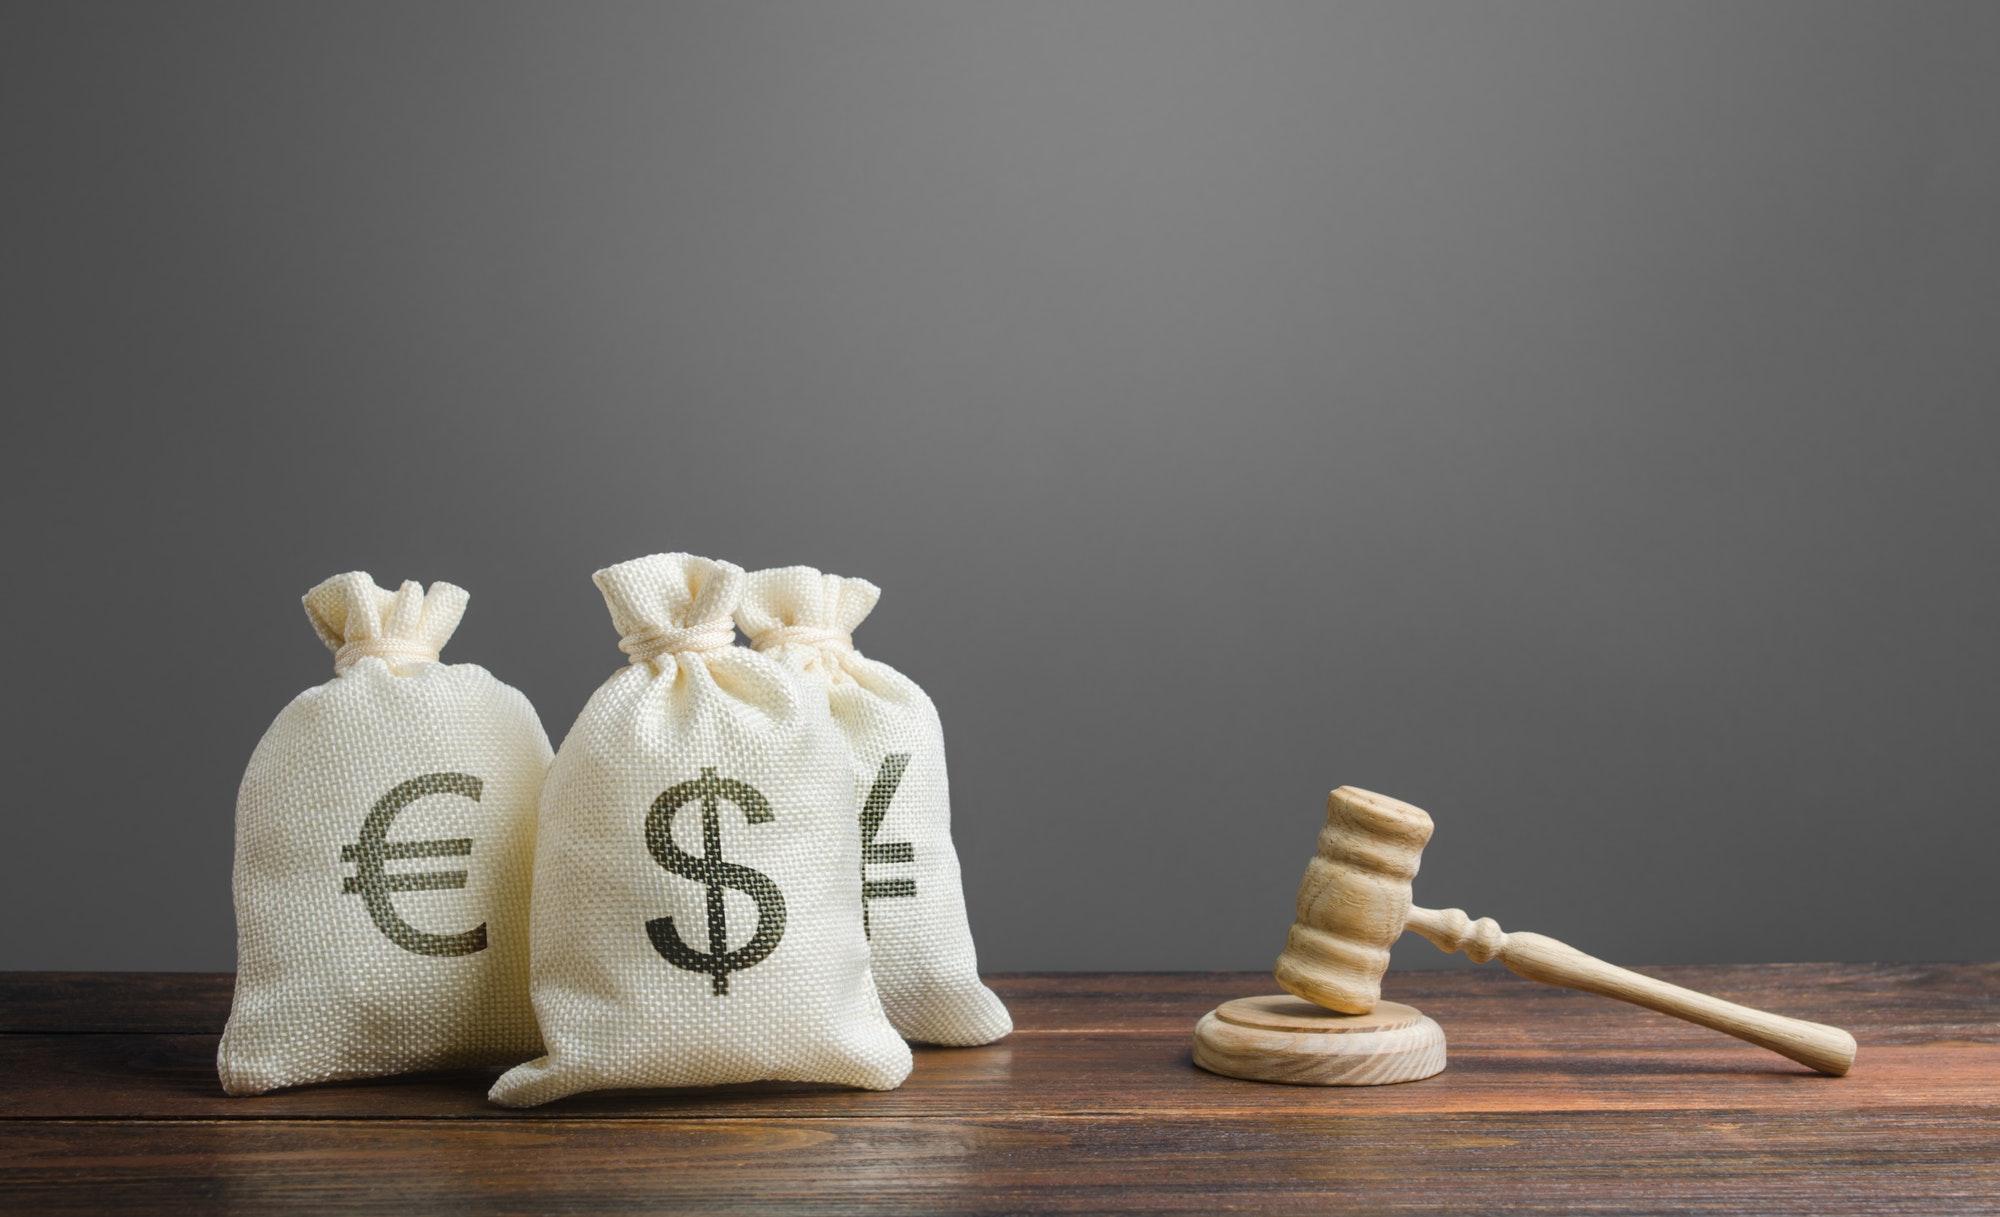 entreprises-avocat-fiscalite-contentieux-fiscal-agn-avocats.jpg